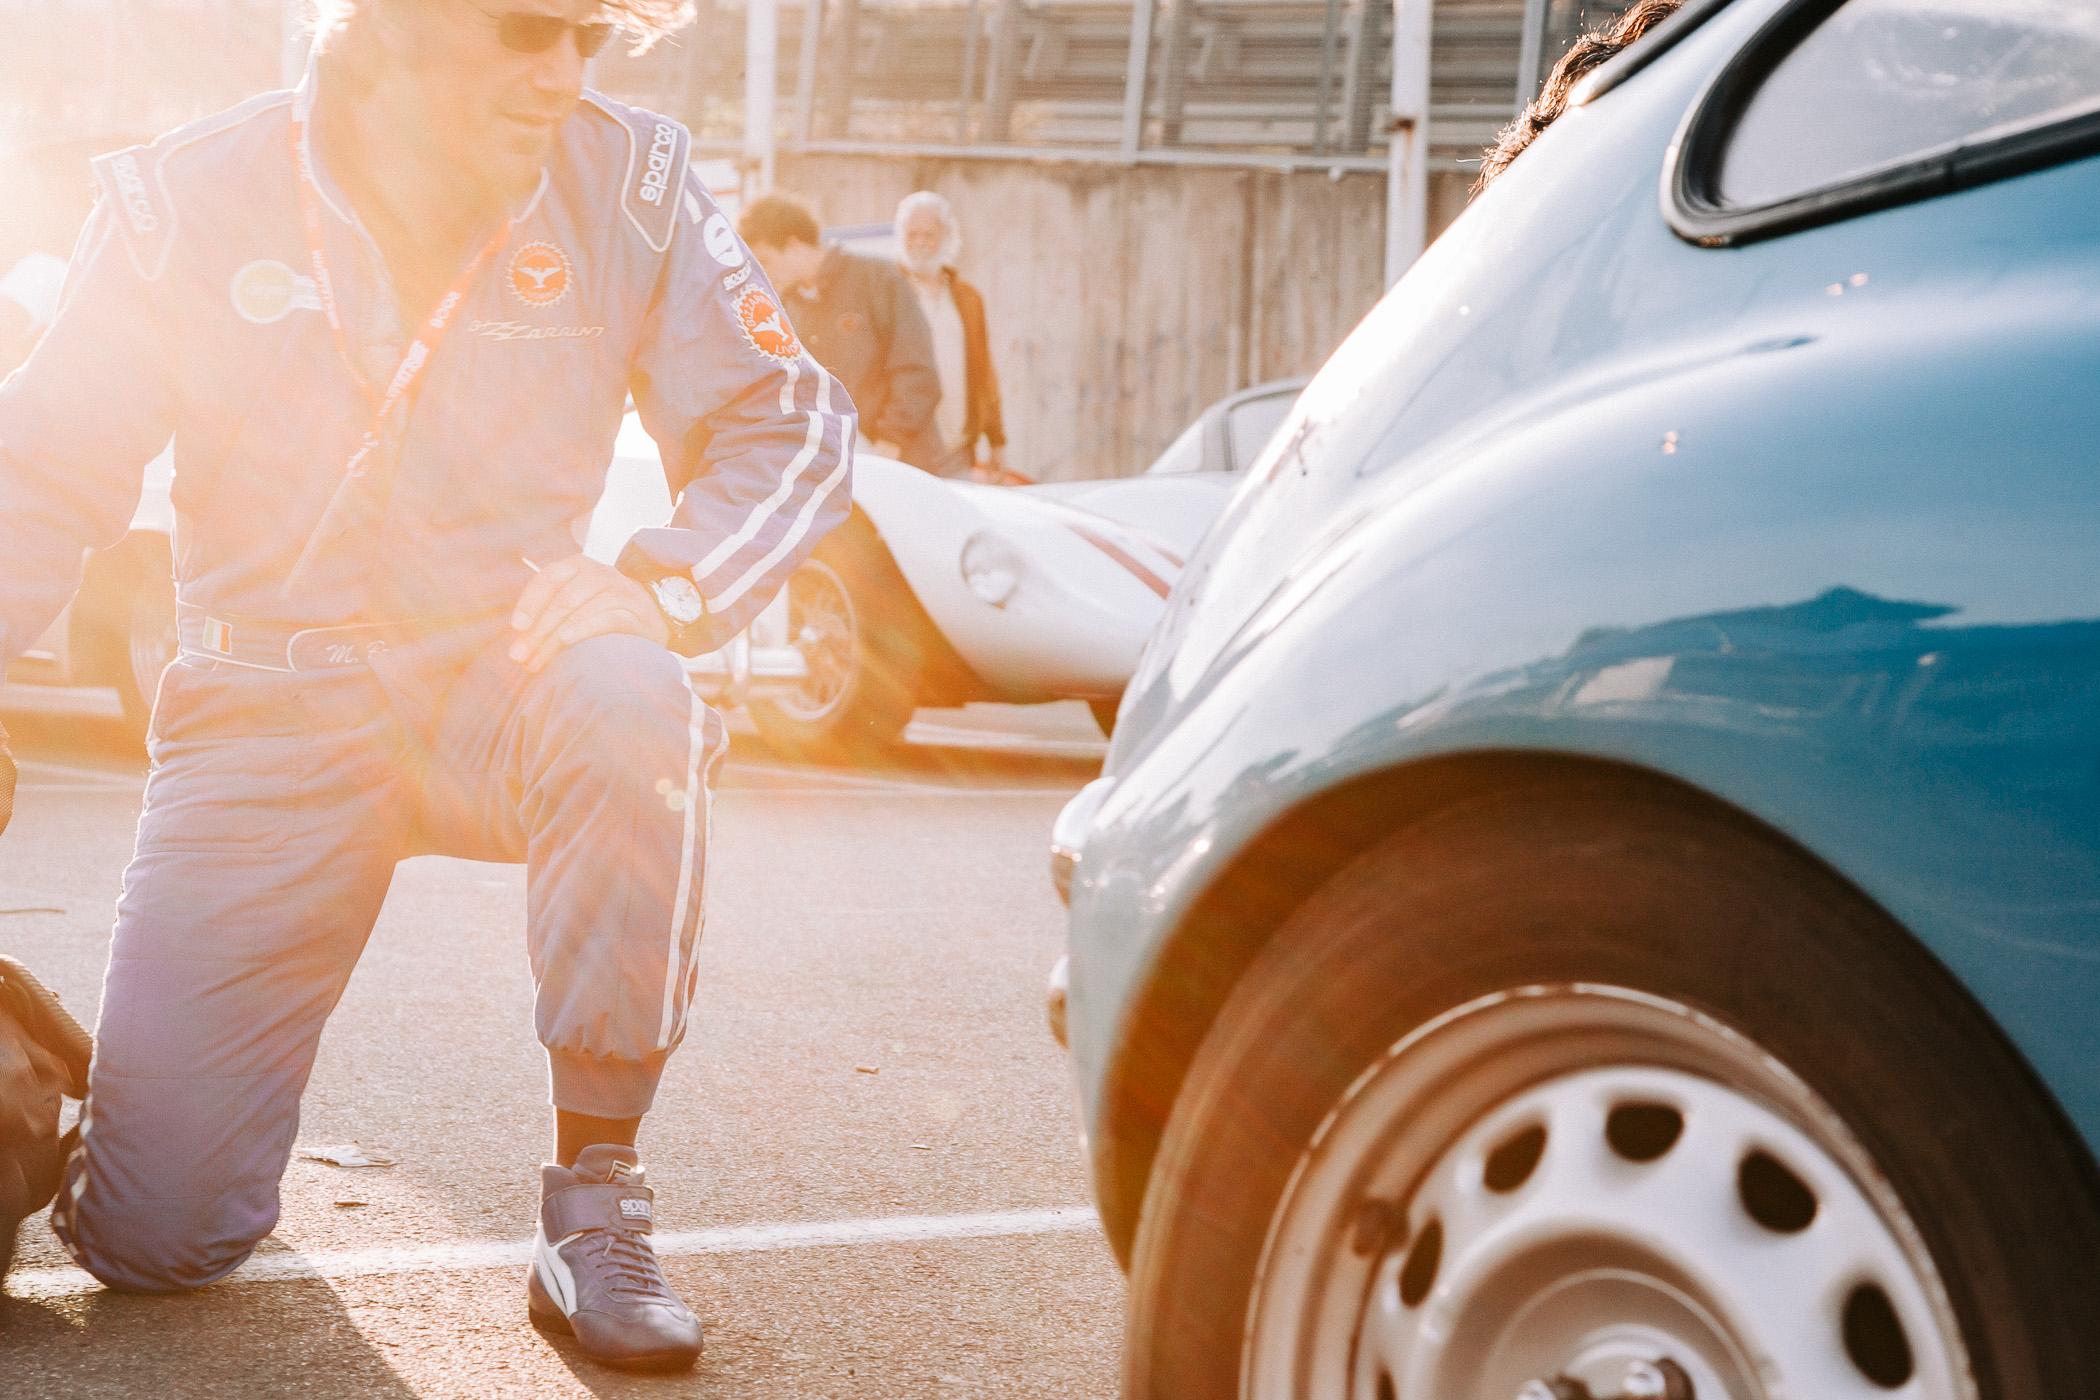 Mille Miglia, Florian Kresse, Rennfahrer, Rom, Fiat, Ferrari, Autofotografie